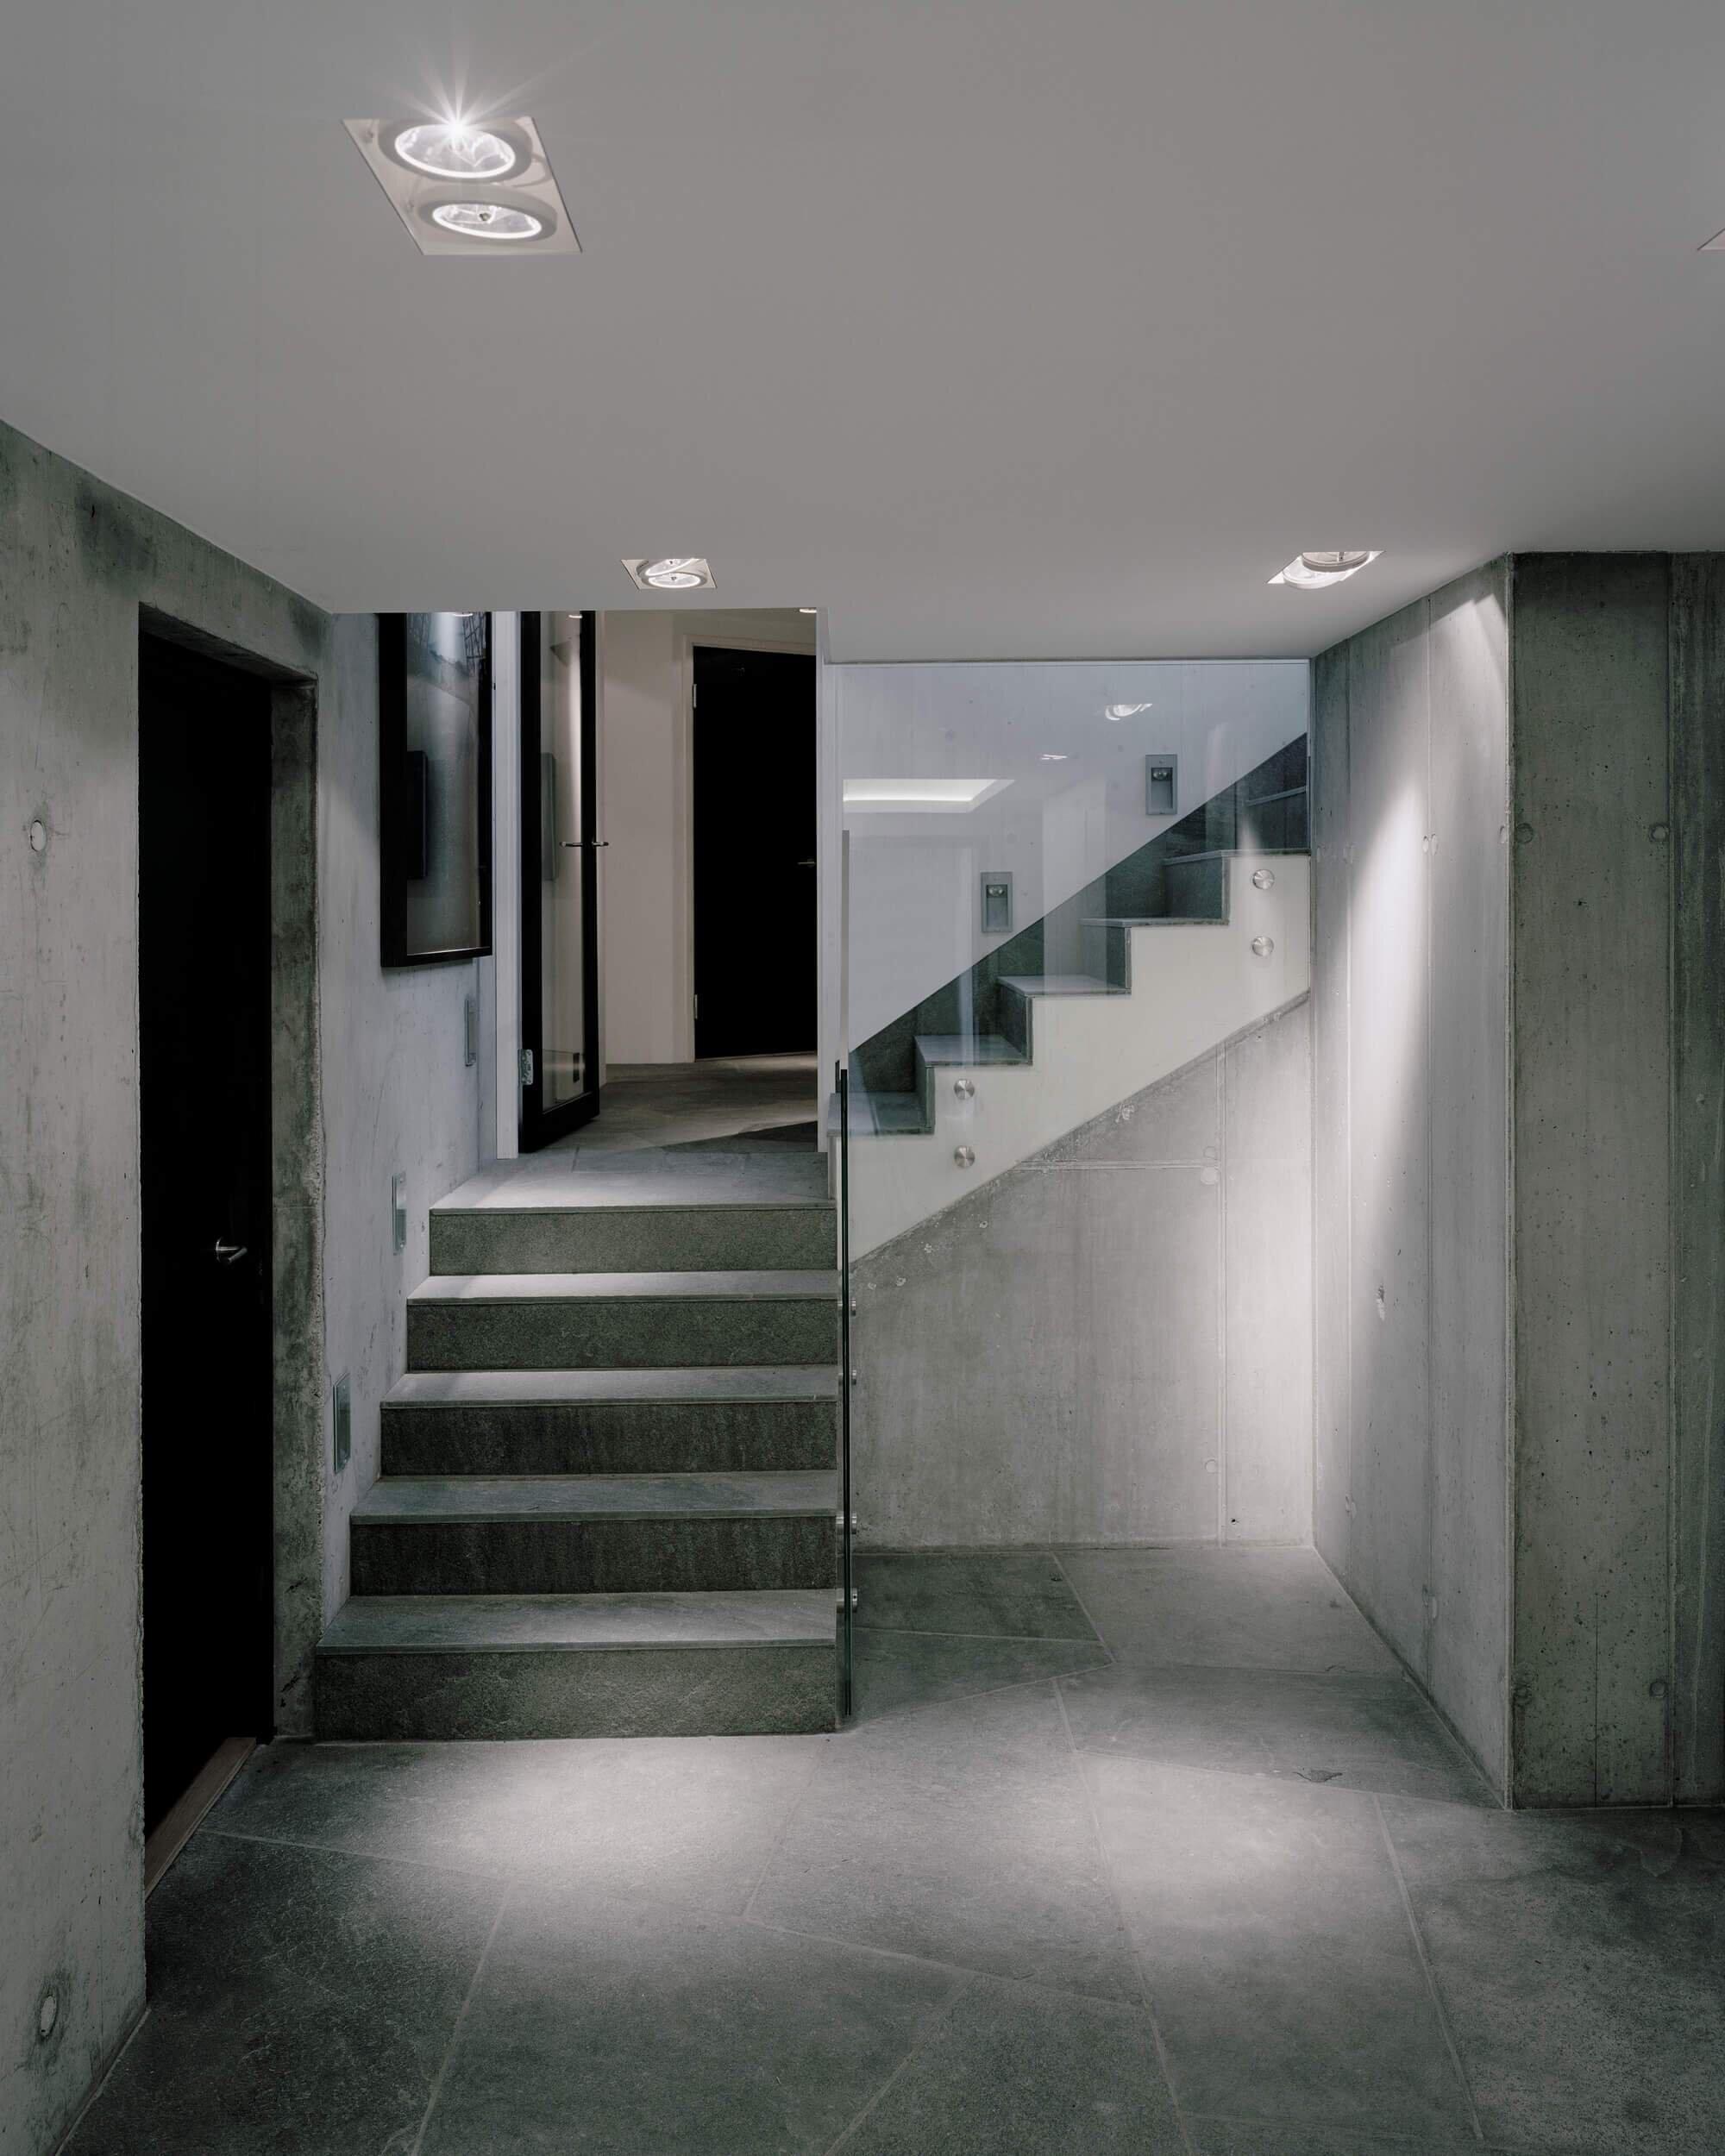 Gubrandslie-Cabin-Helen-&-Hard-architects-Norway-2